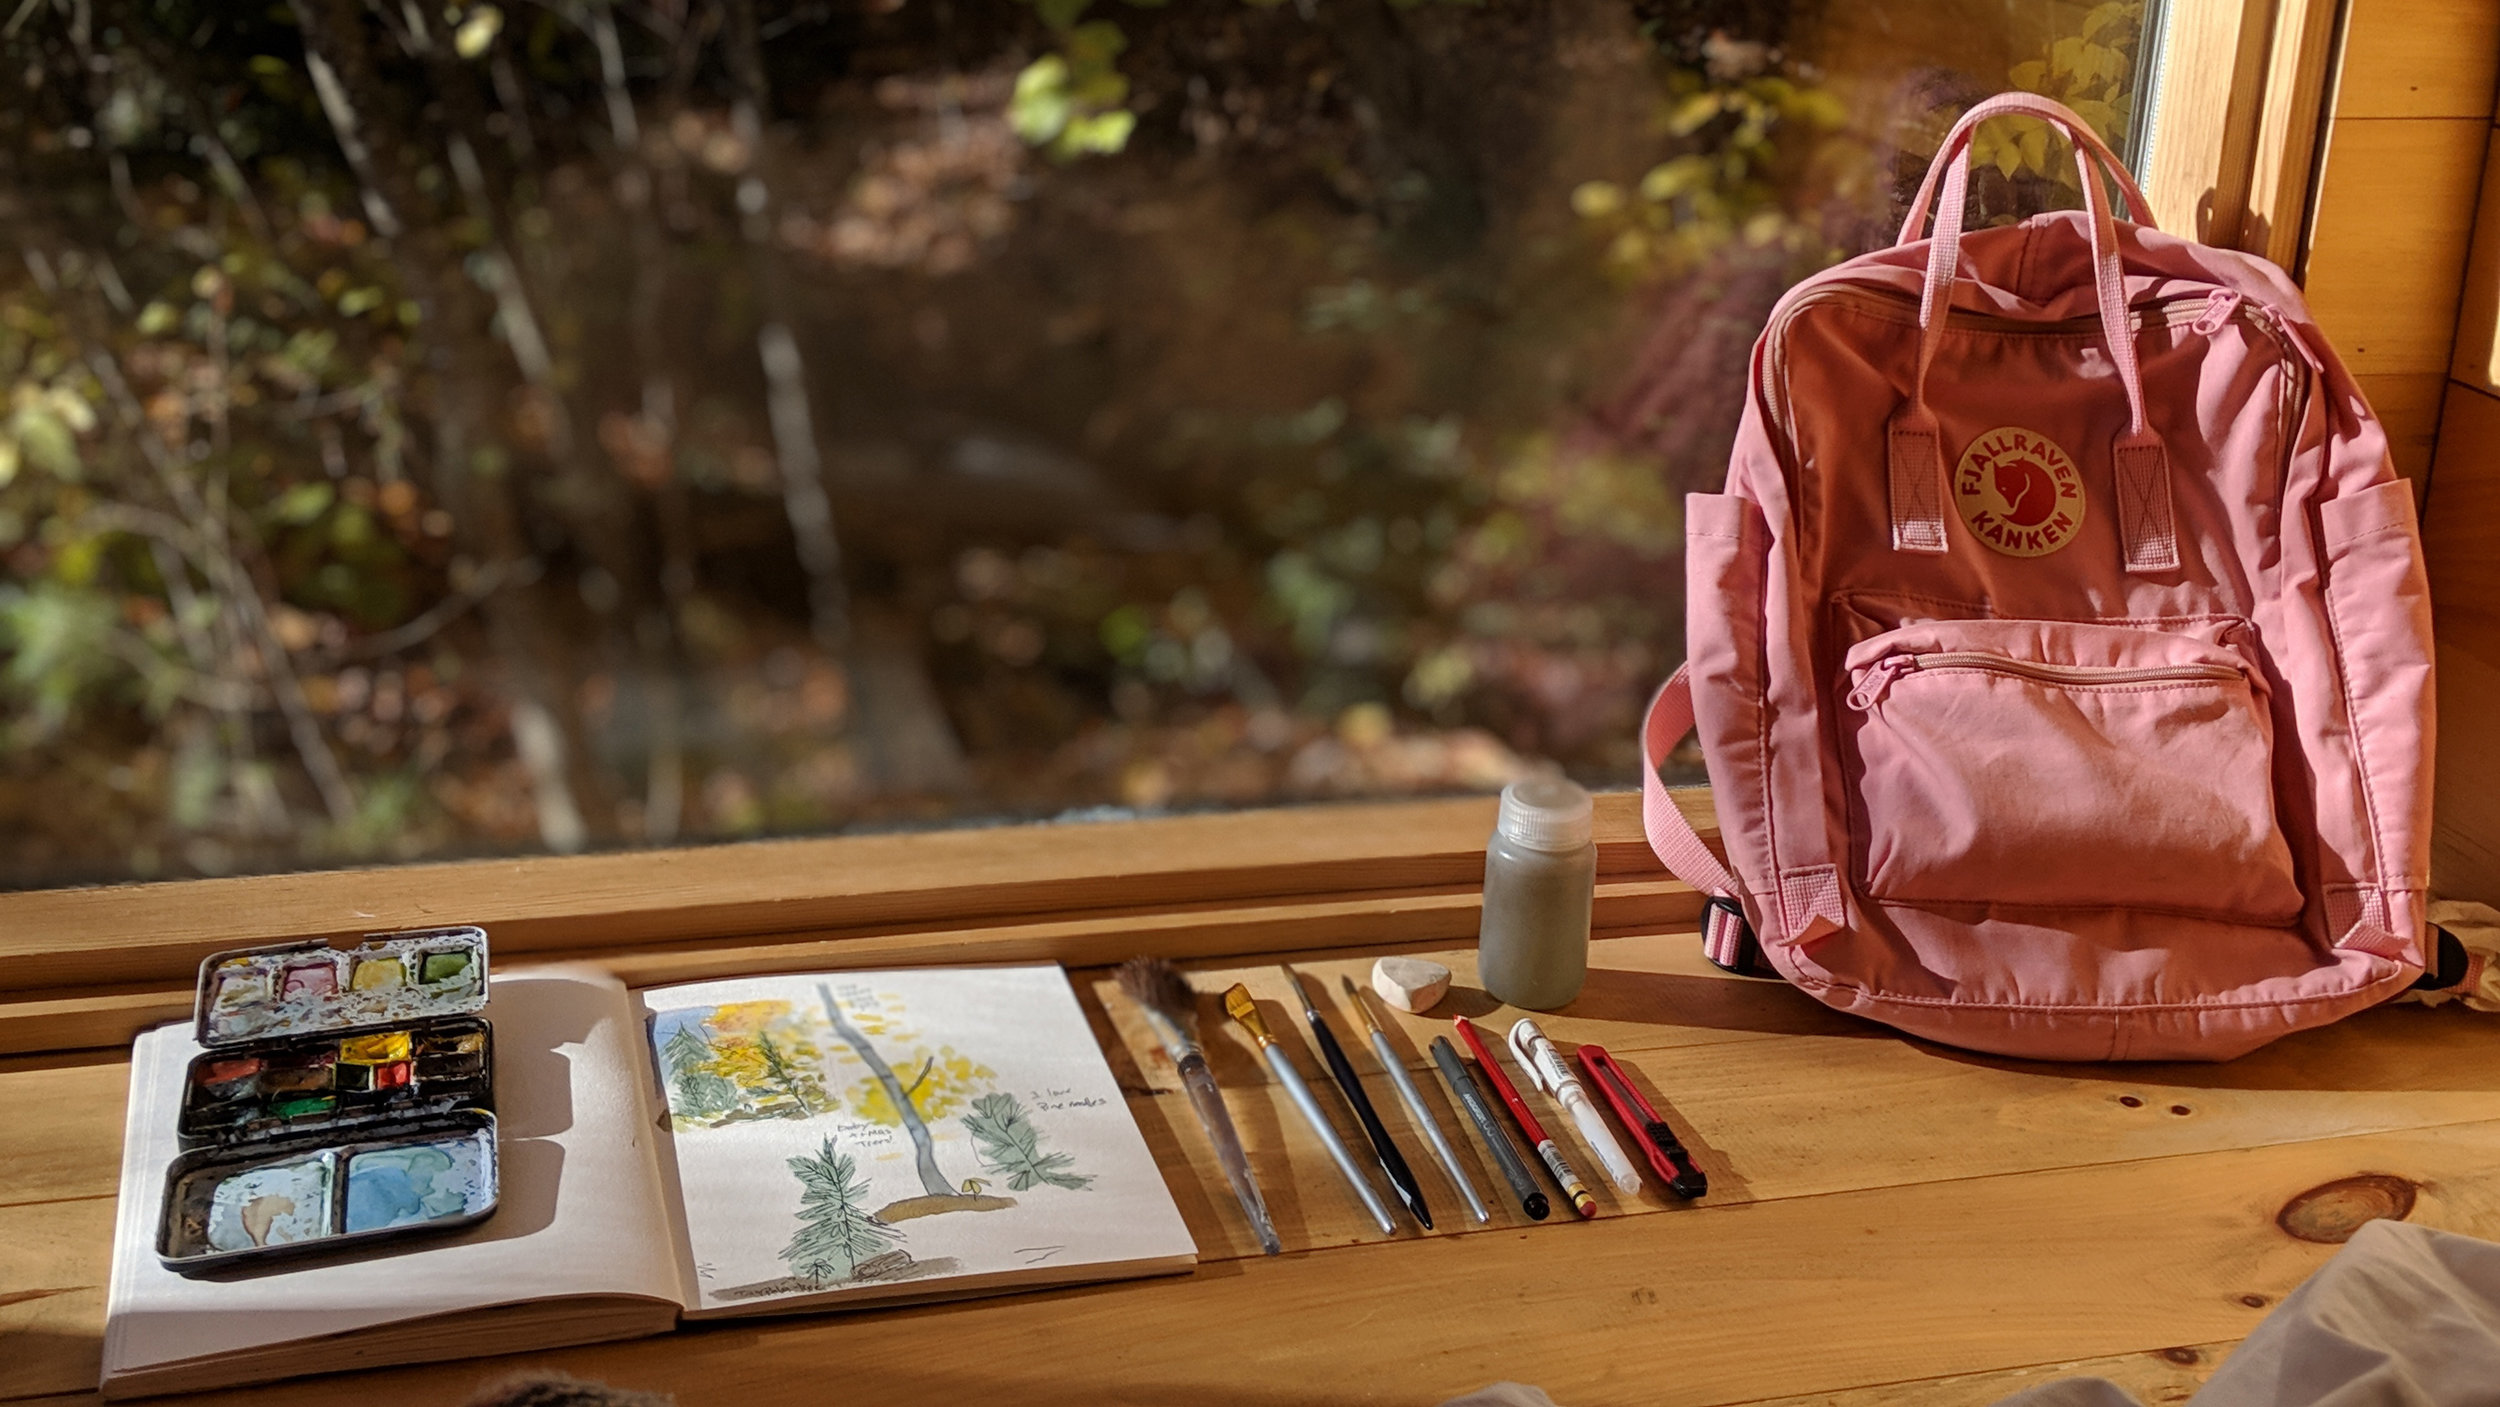 K Rose Illustration - The art of Kelly Rose, Illustrator, Designer, Cat Enthusiast